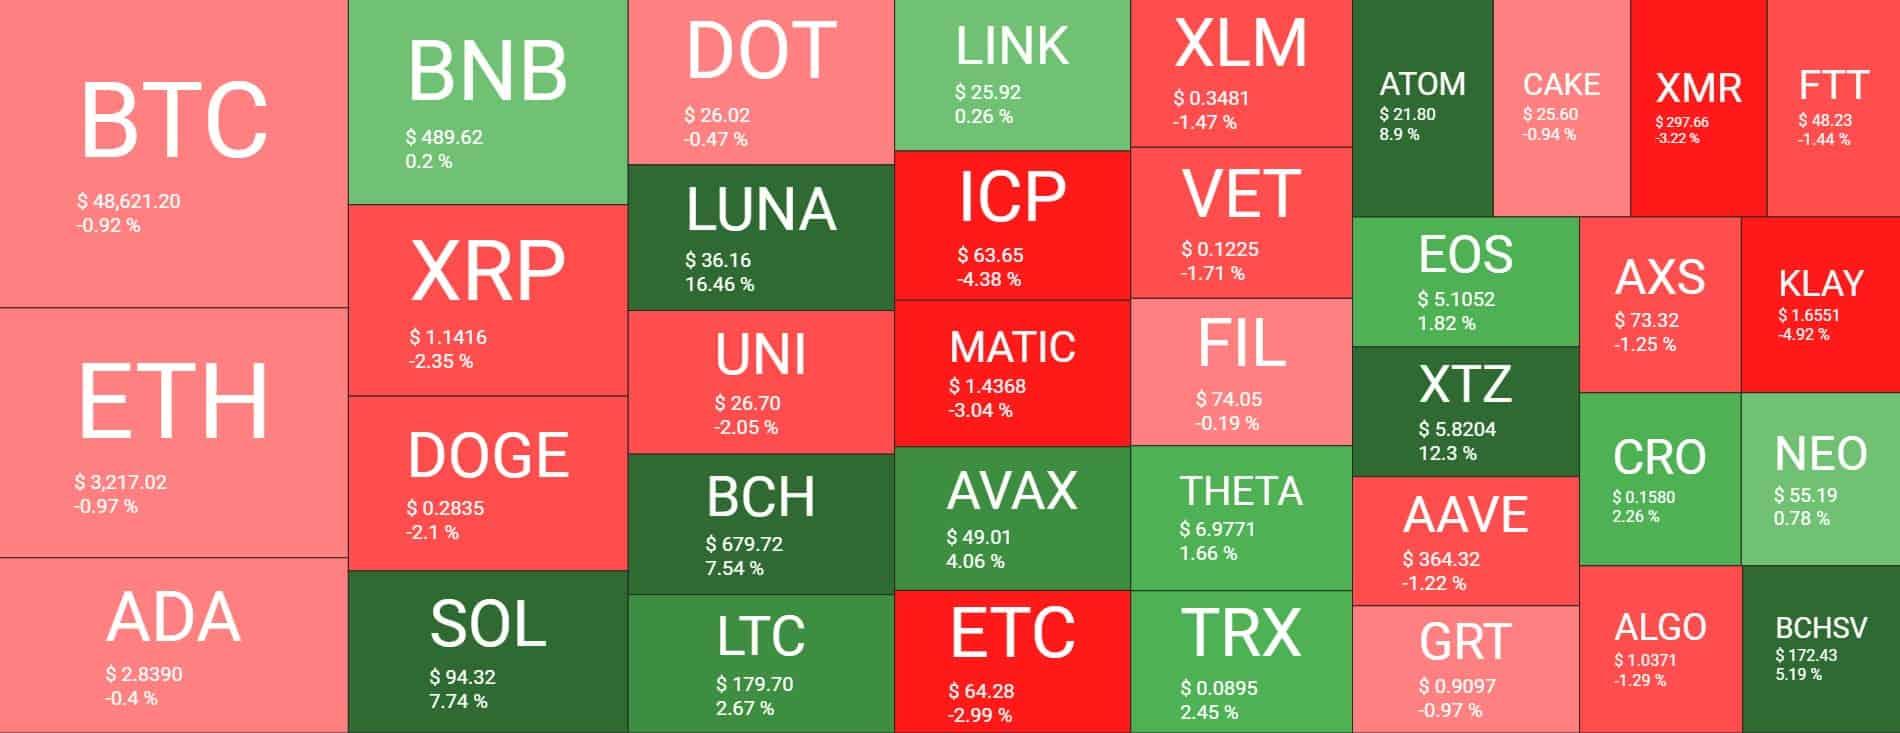 Bitcoin Struggles Below K: Solana (SOL) Now Top 8 Surpassing Polkadot (Market Watch)